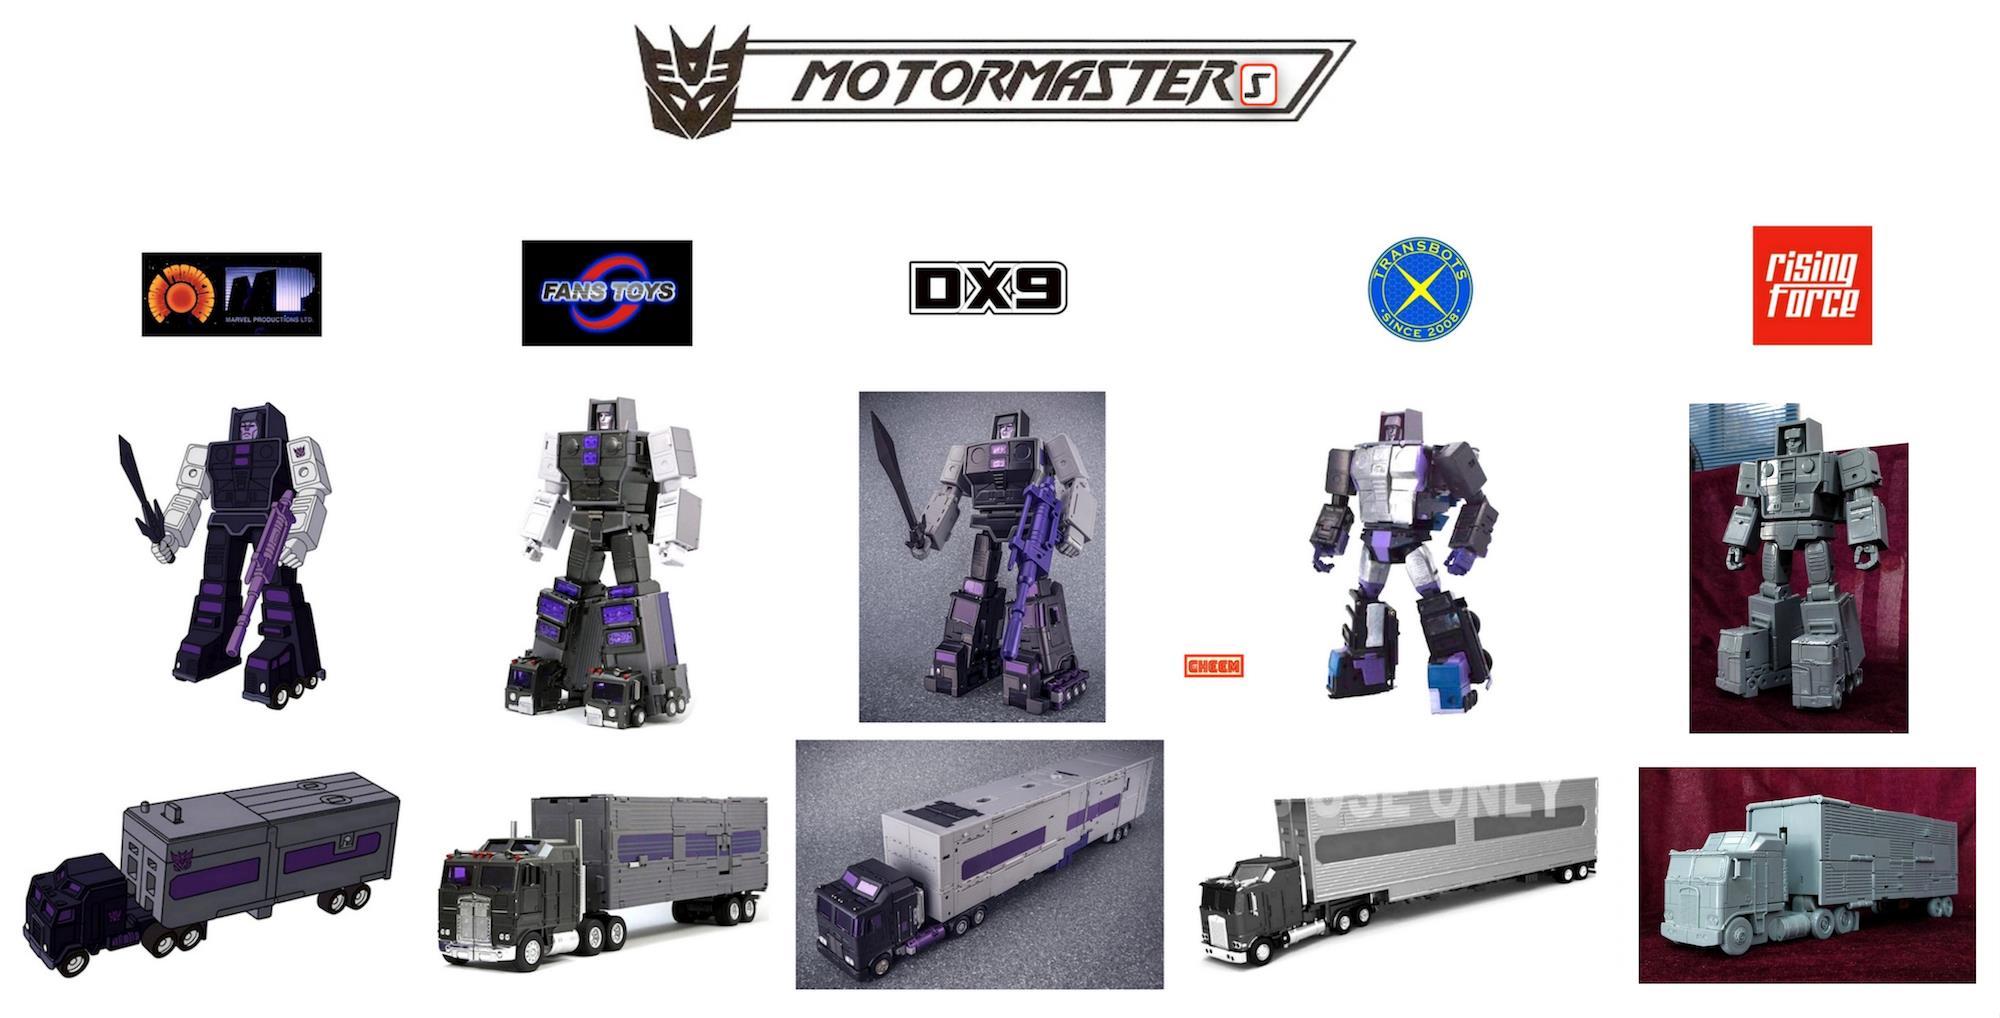 [Dx9 Toys] Produit Tiers - Jouet Attila (D13 à D17) - aka Menasor/Menaseur (Stunticons) - Page 3 3XVGpfmg_o